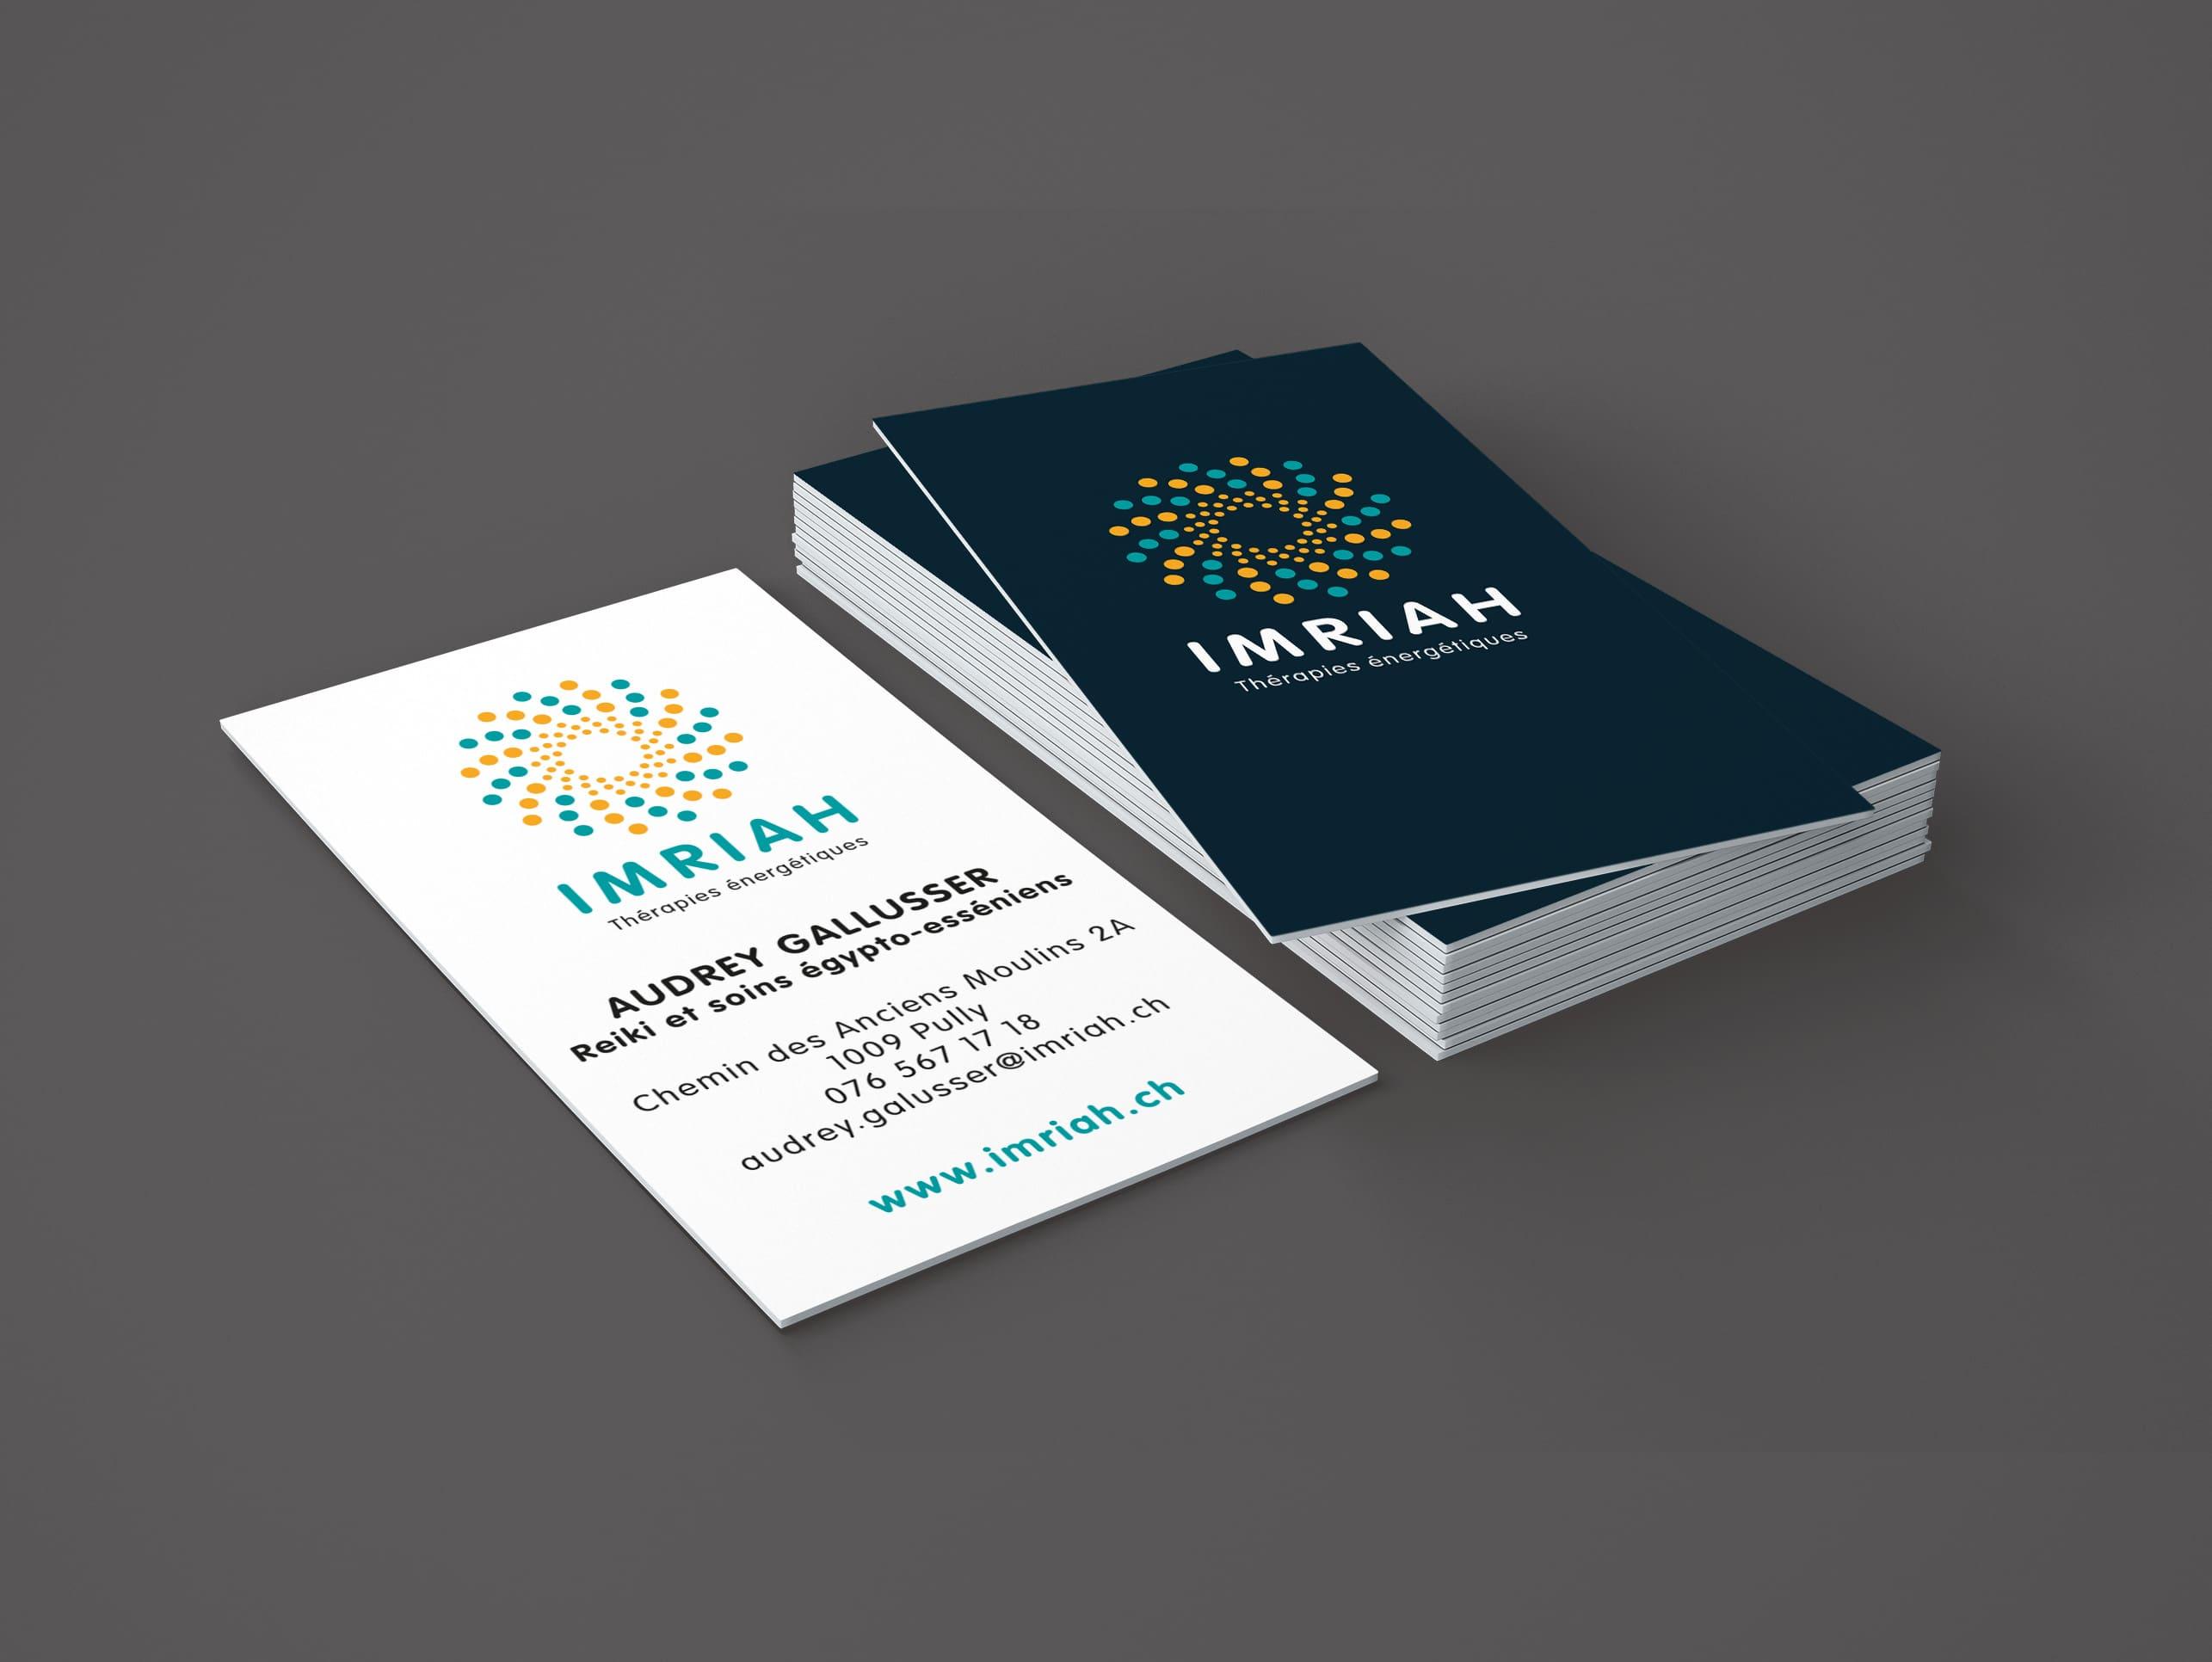 Logo, carte de visite IMRIAH, thérapies énergétiques - Haymoz design